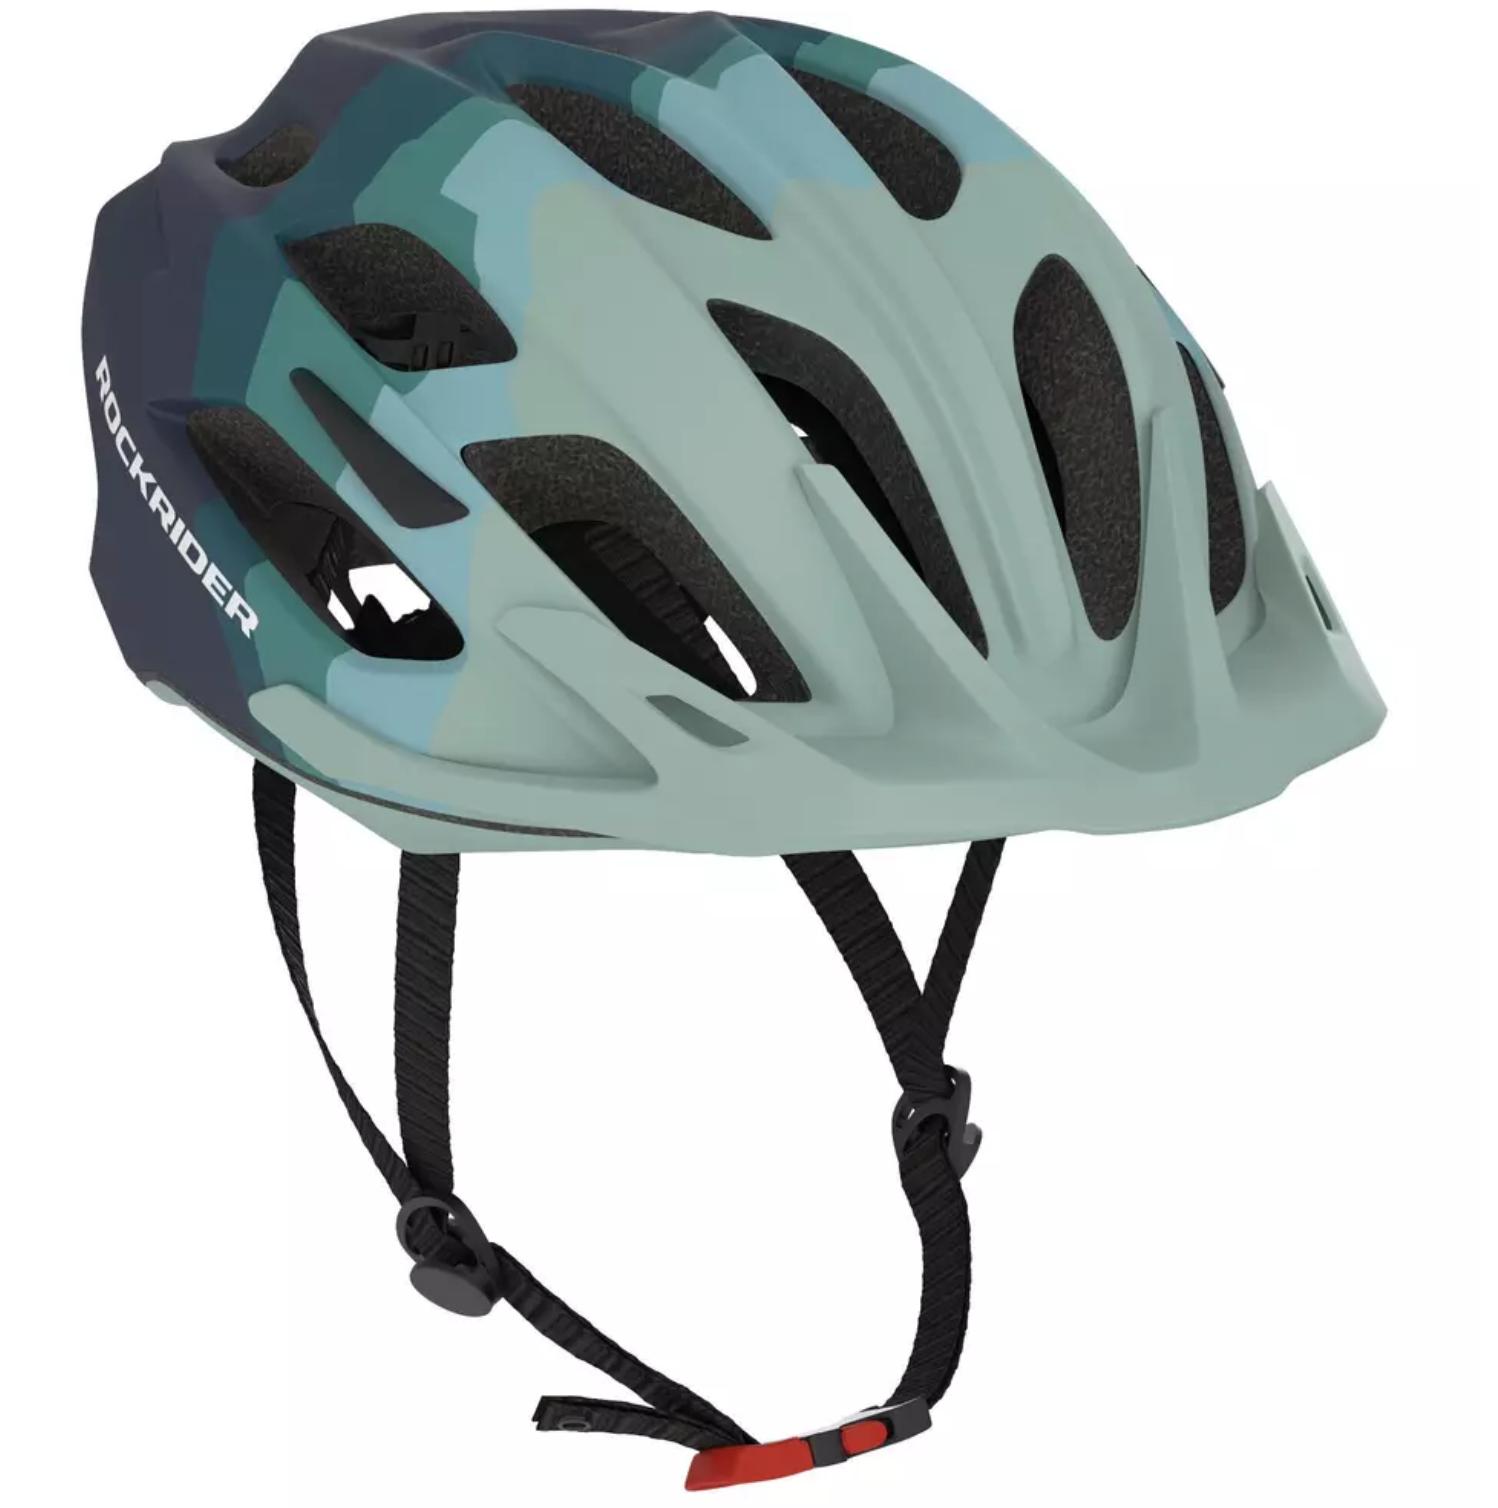 Fahrradhelm Rockrider MTB ST 500 Damen - blau/grün - Größe L (59-61 cm)